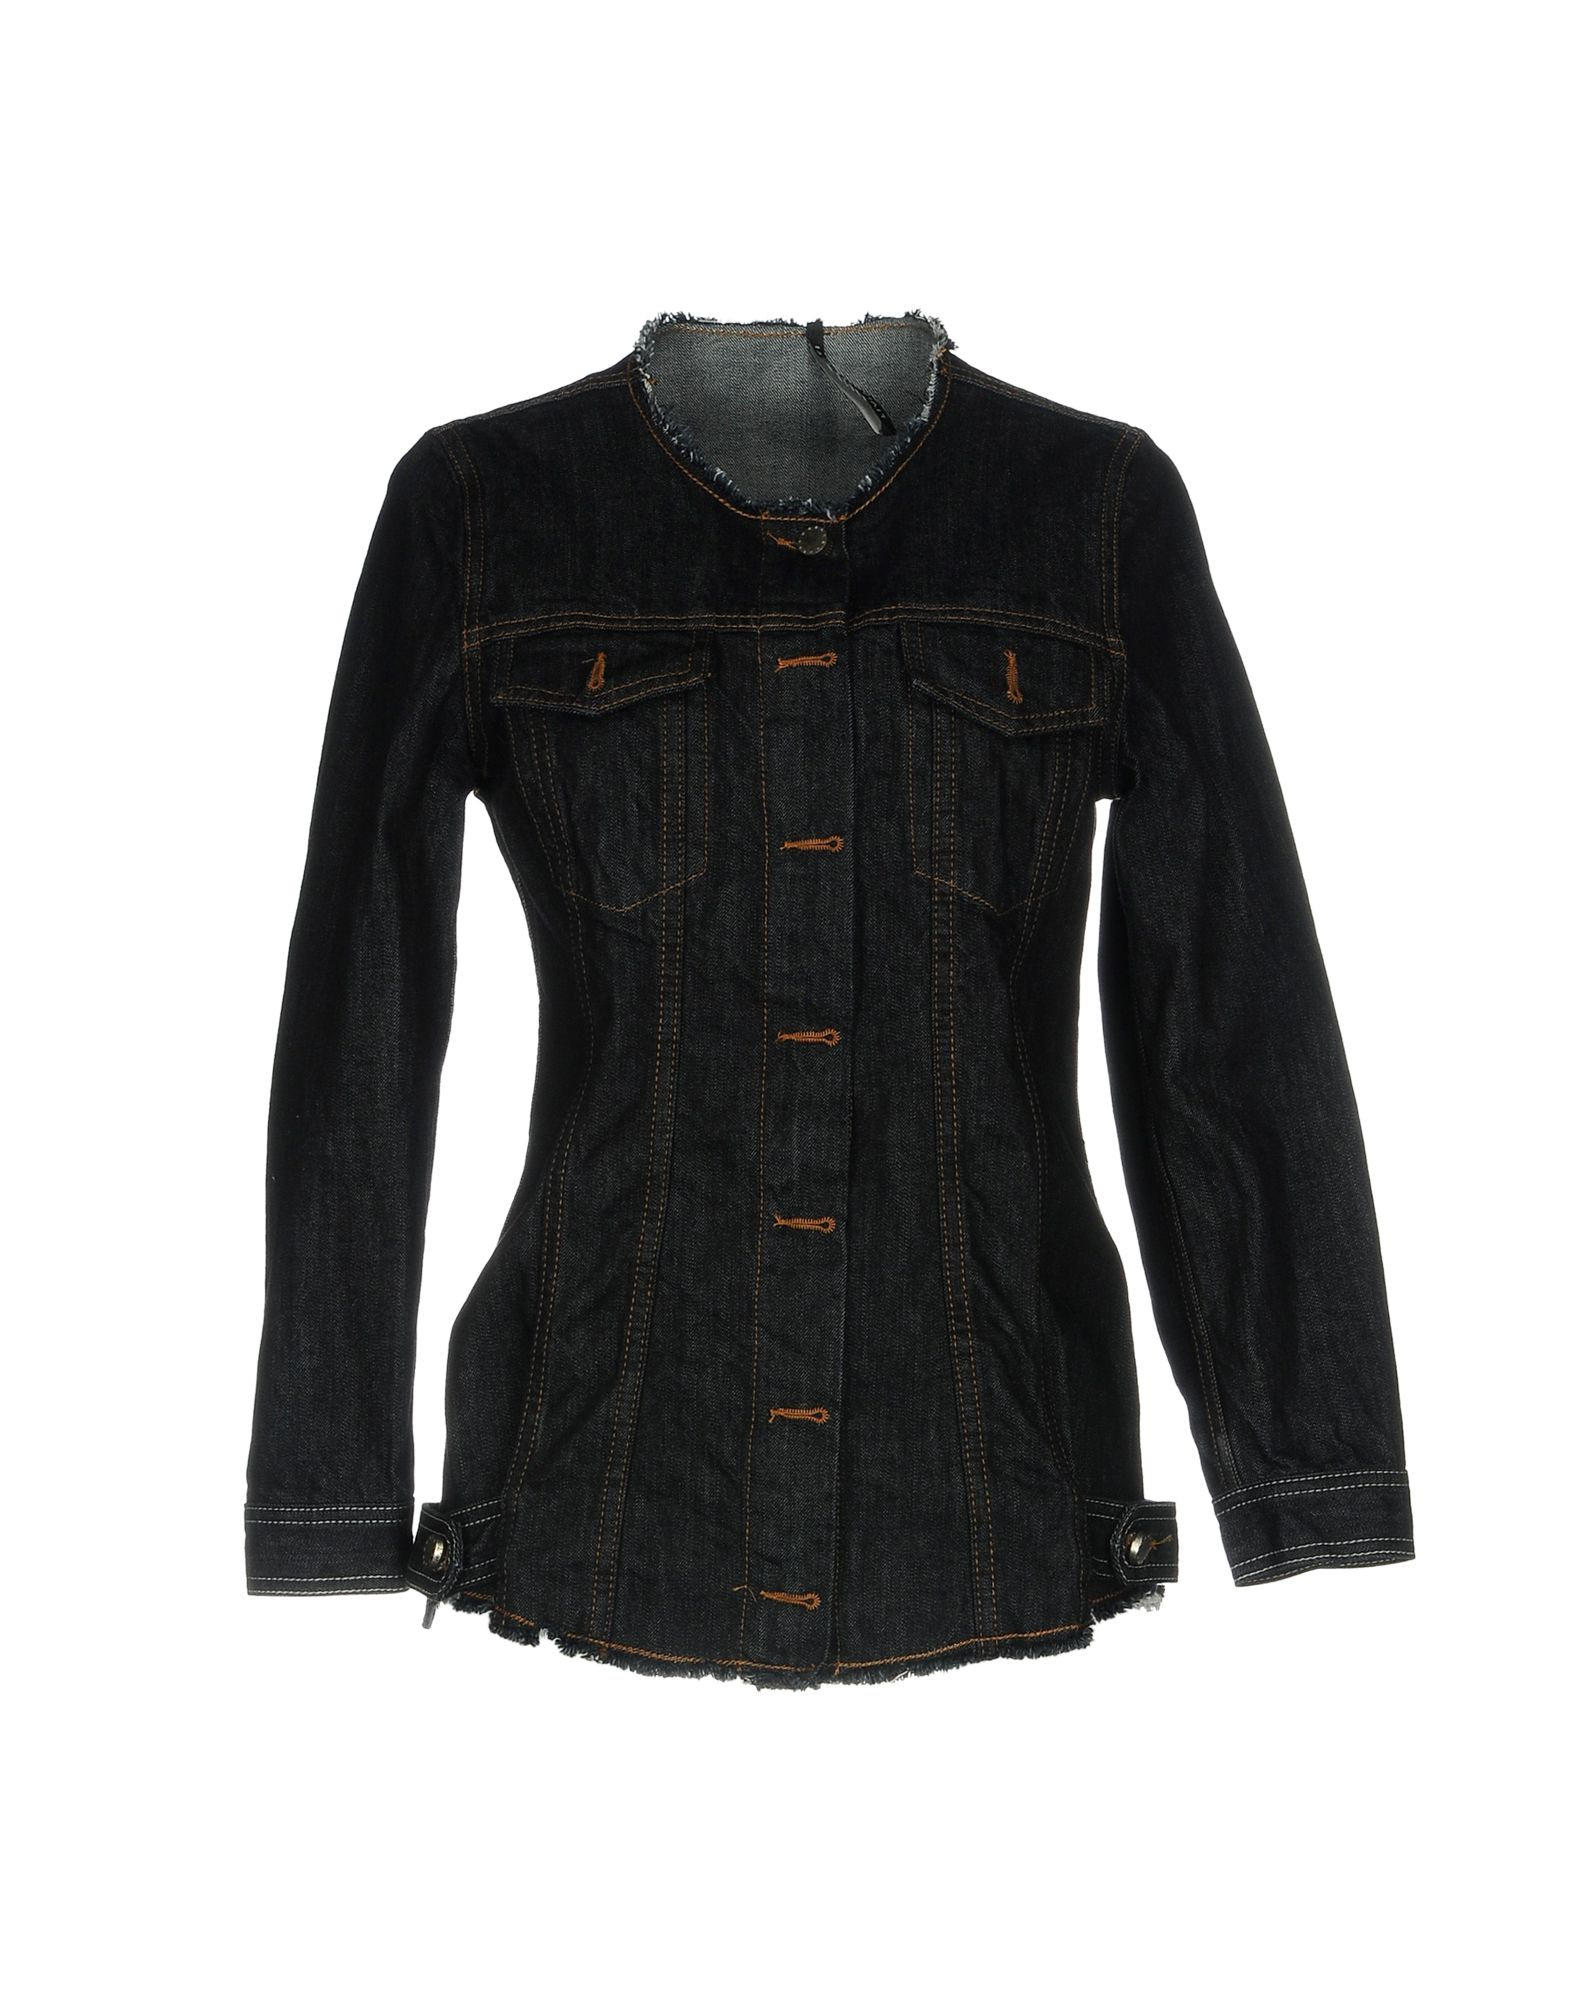 LIVIANA CONTI Джинсовая верхняя одежда wood wood джинсовая верхняя одежда